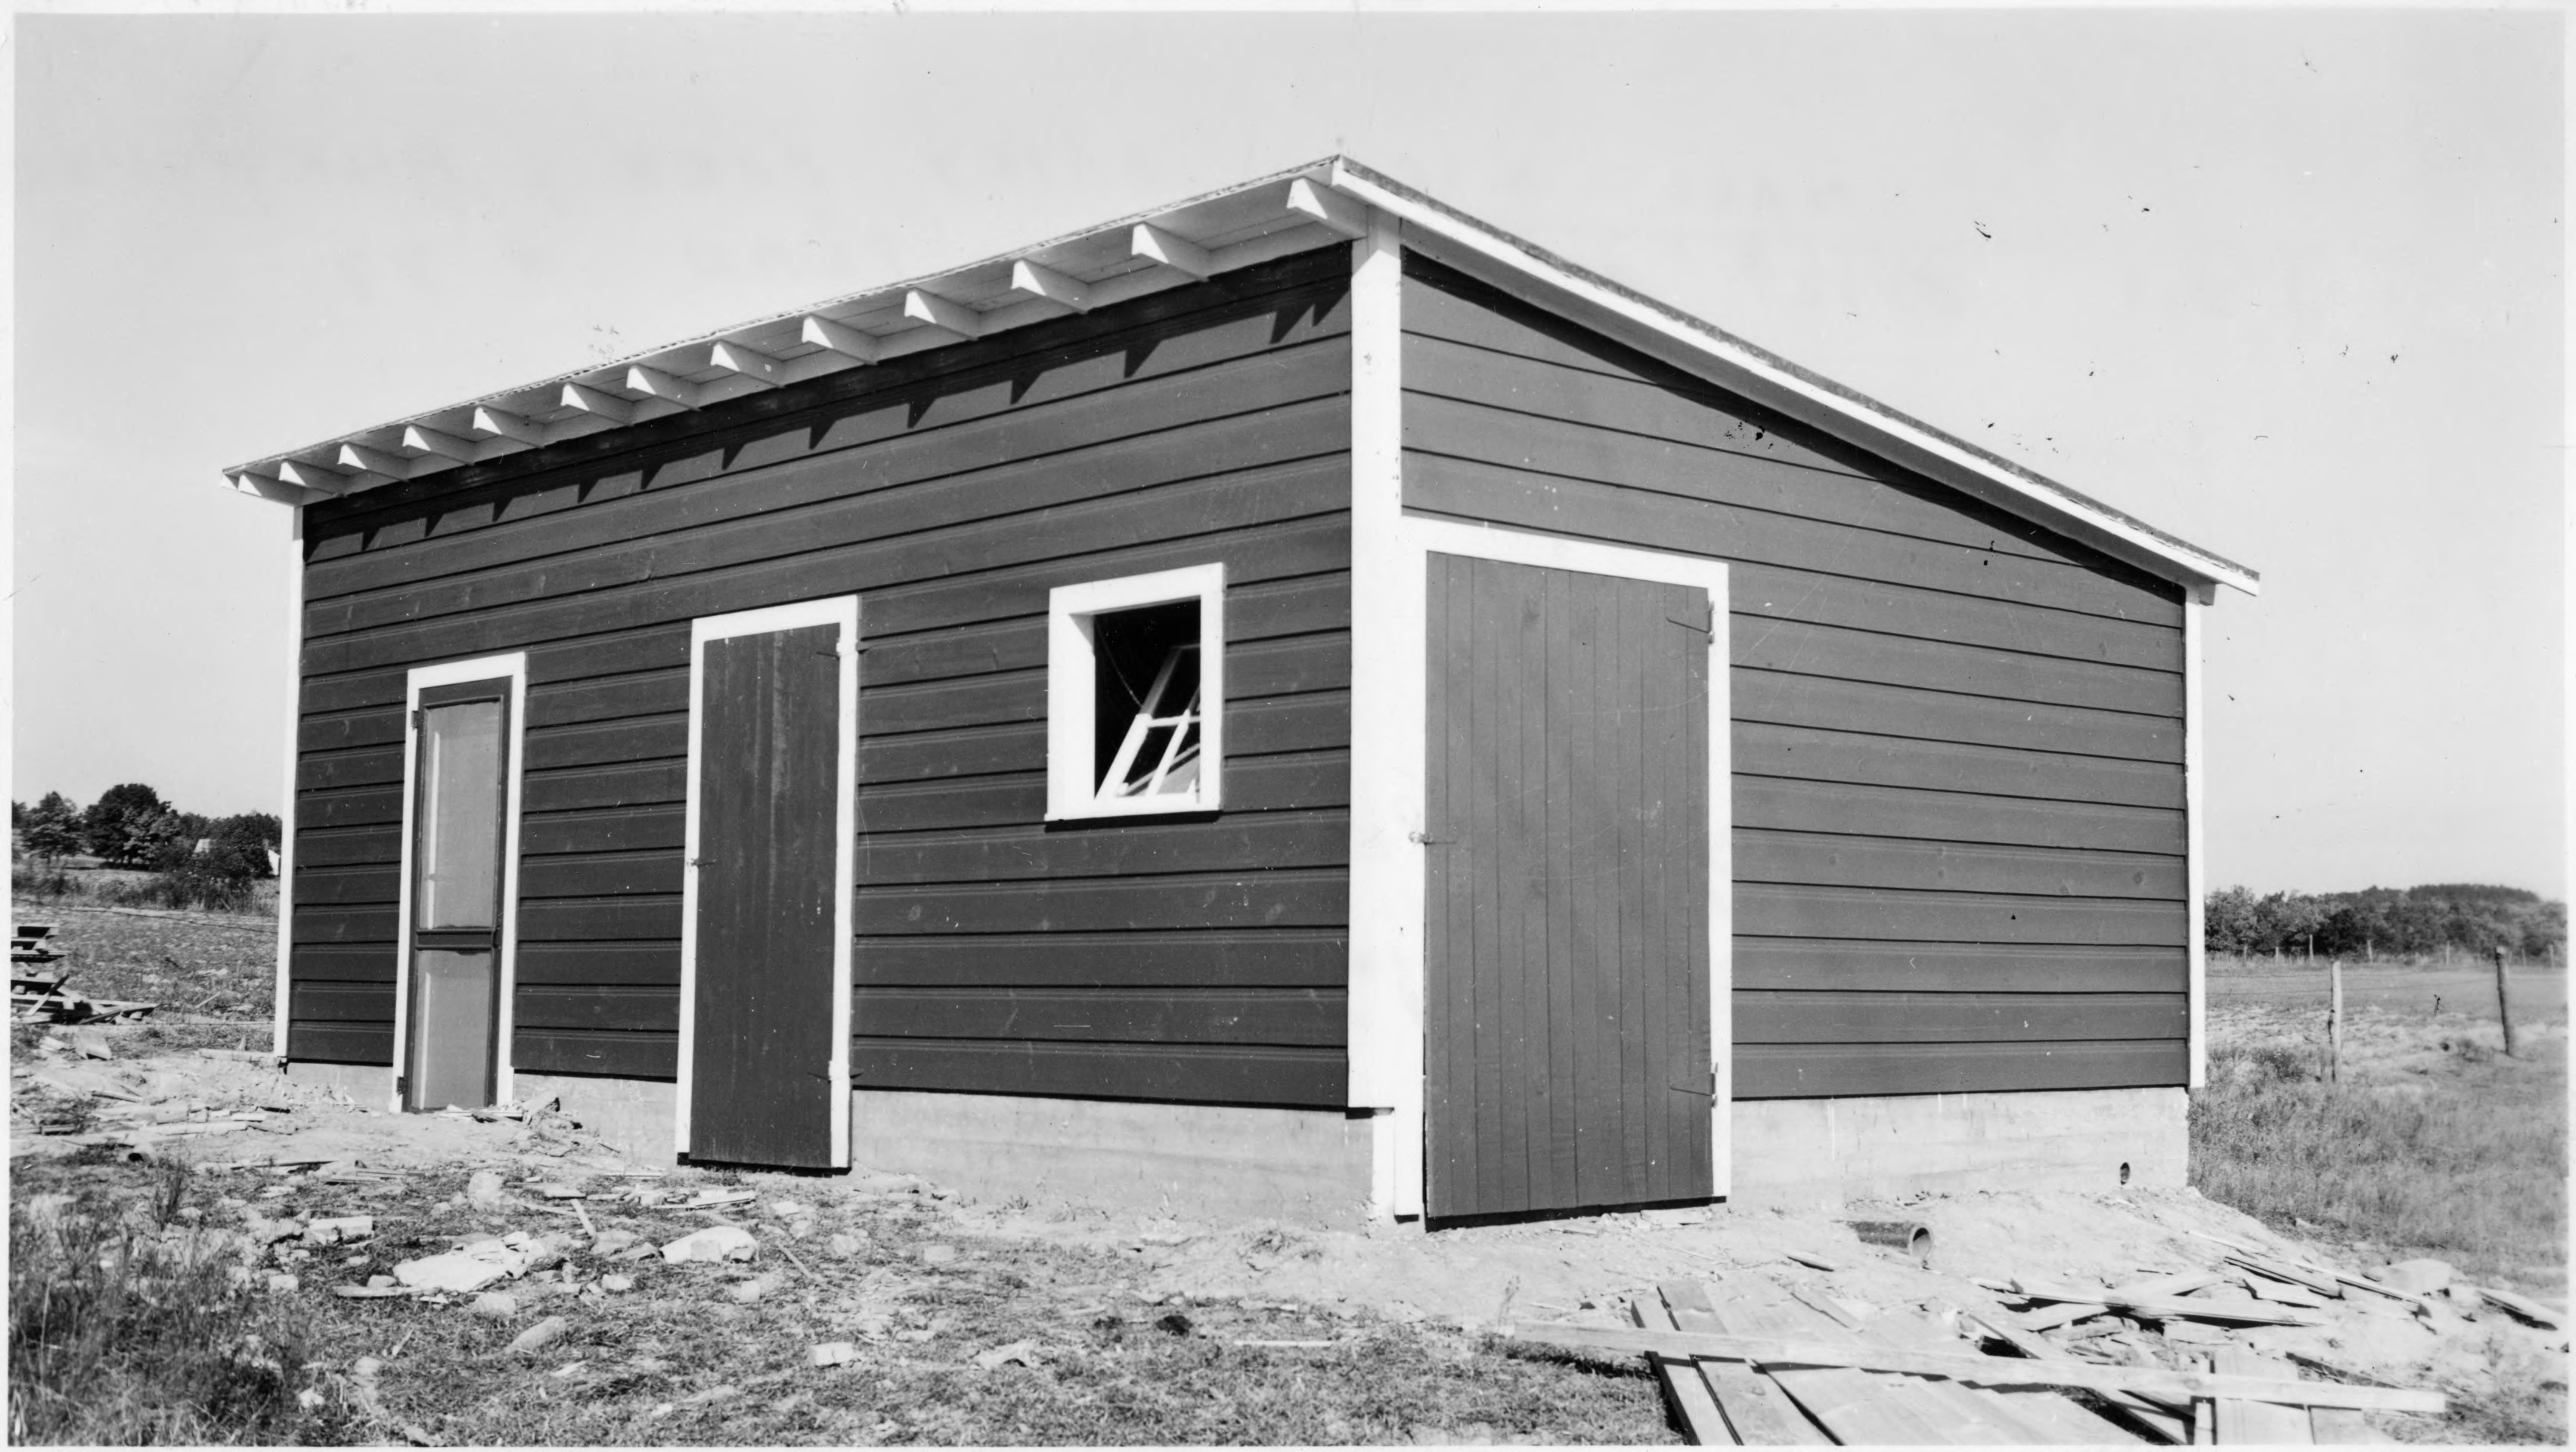 Nail blog small cow barn plans for Small barn ideas